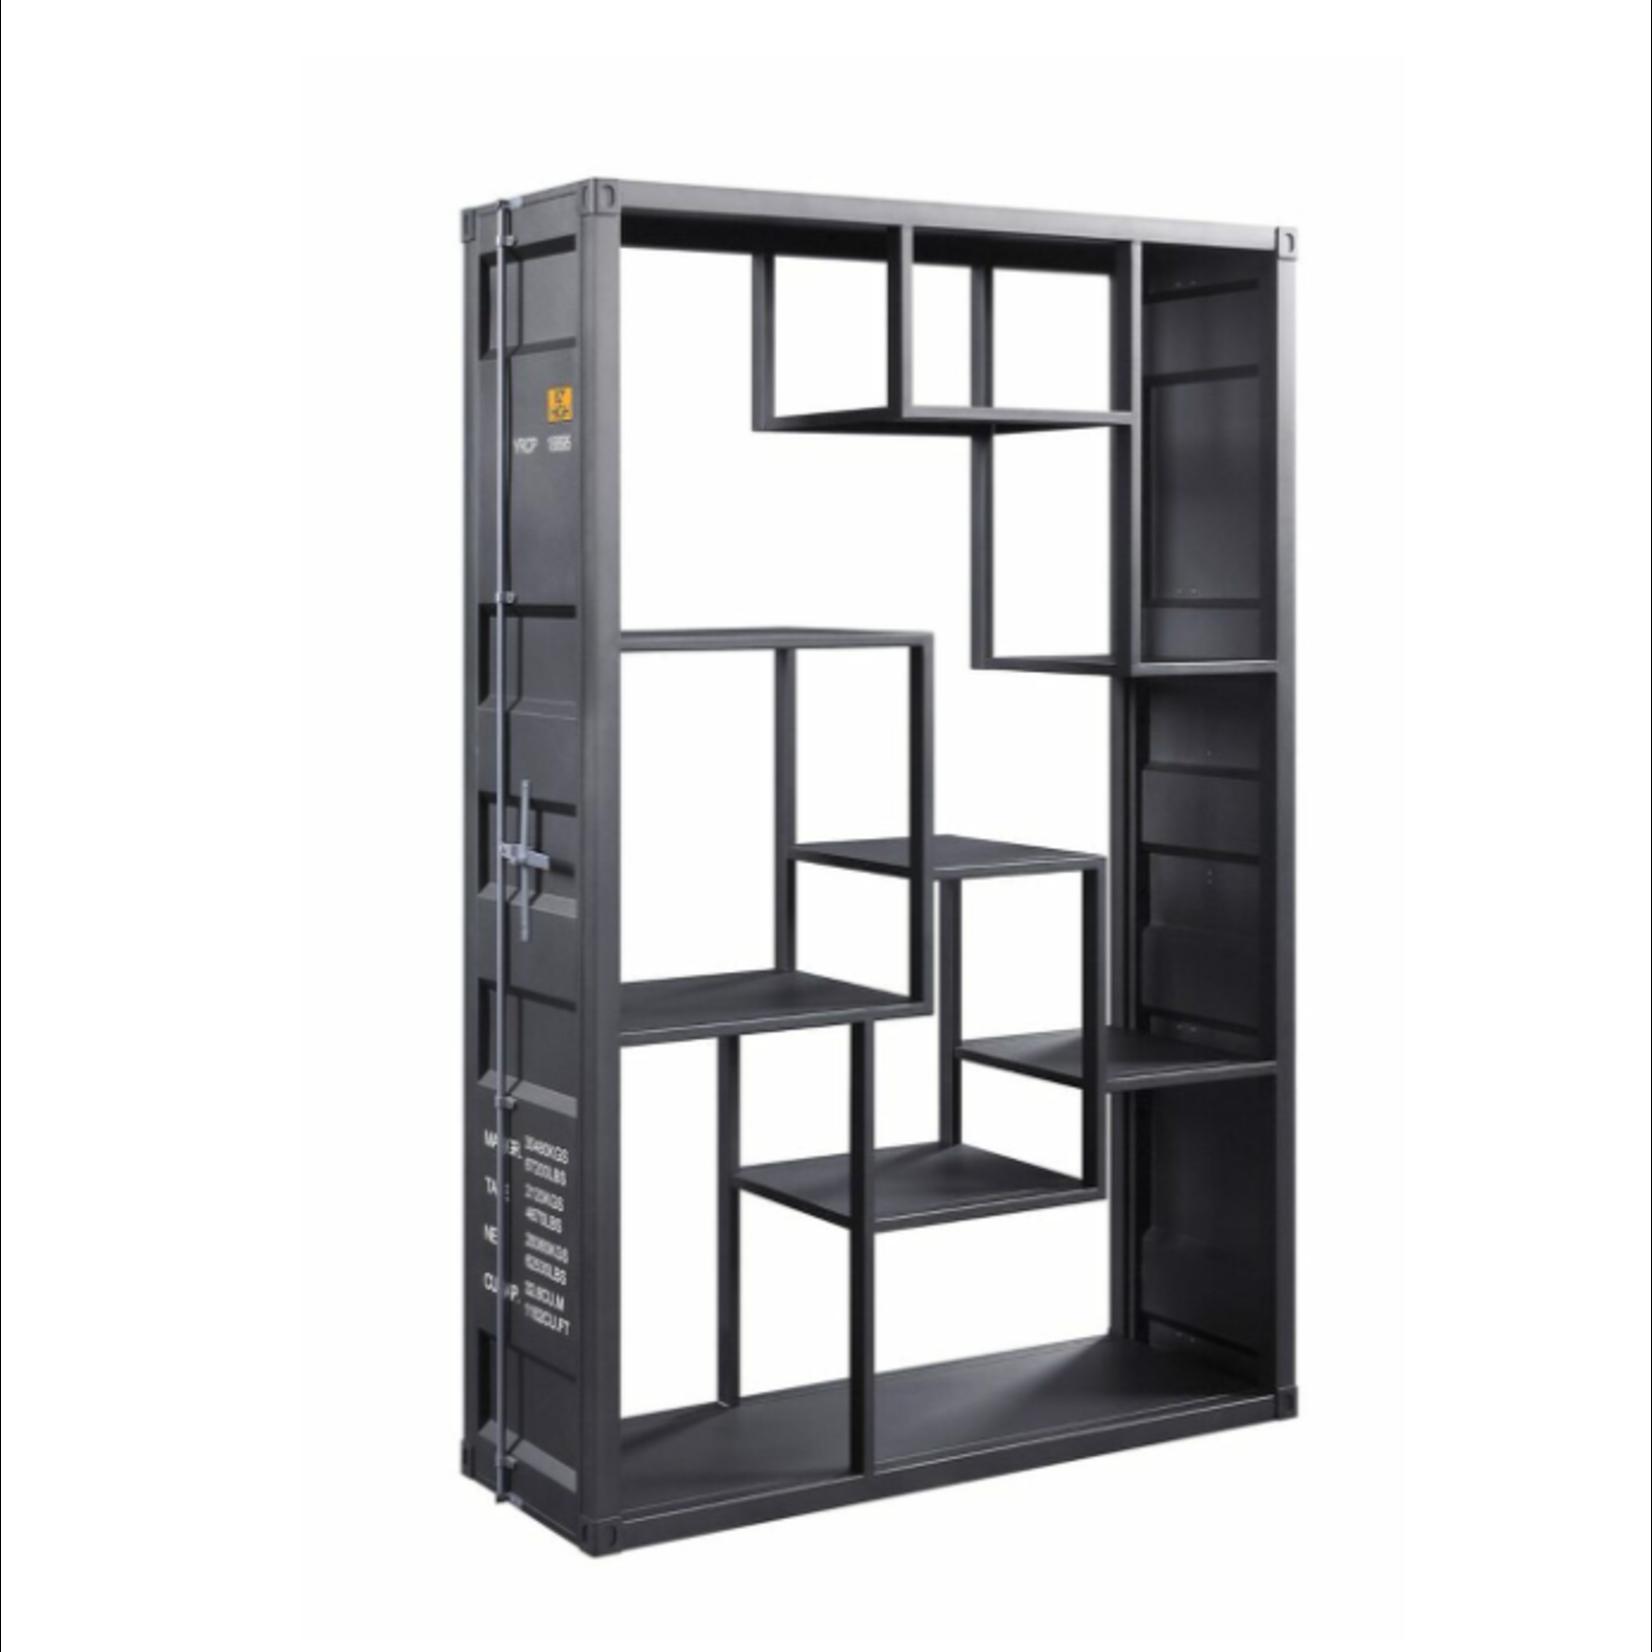 10420 Acme Furniture Cargo Shelf Rack